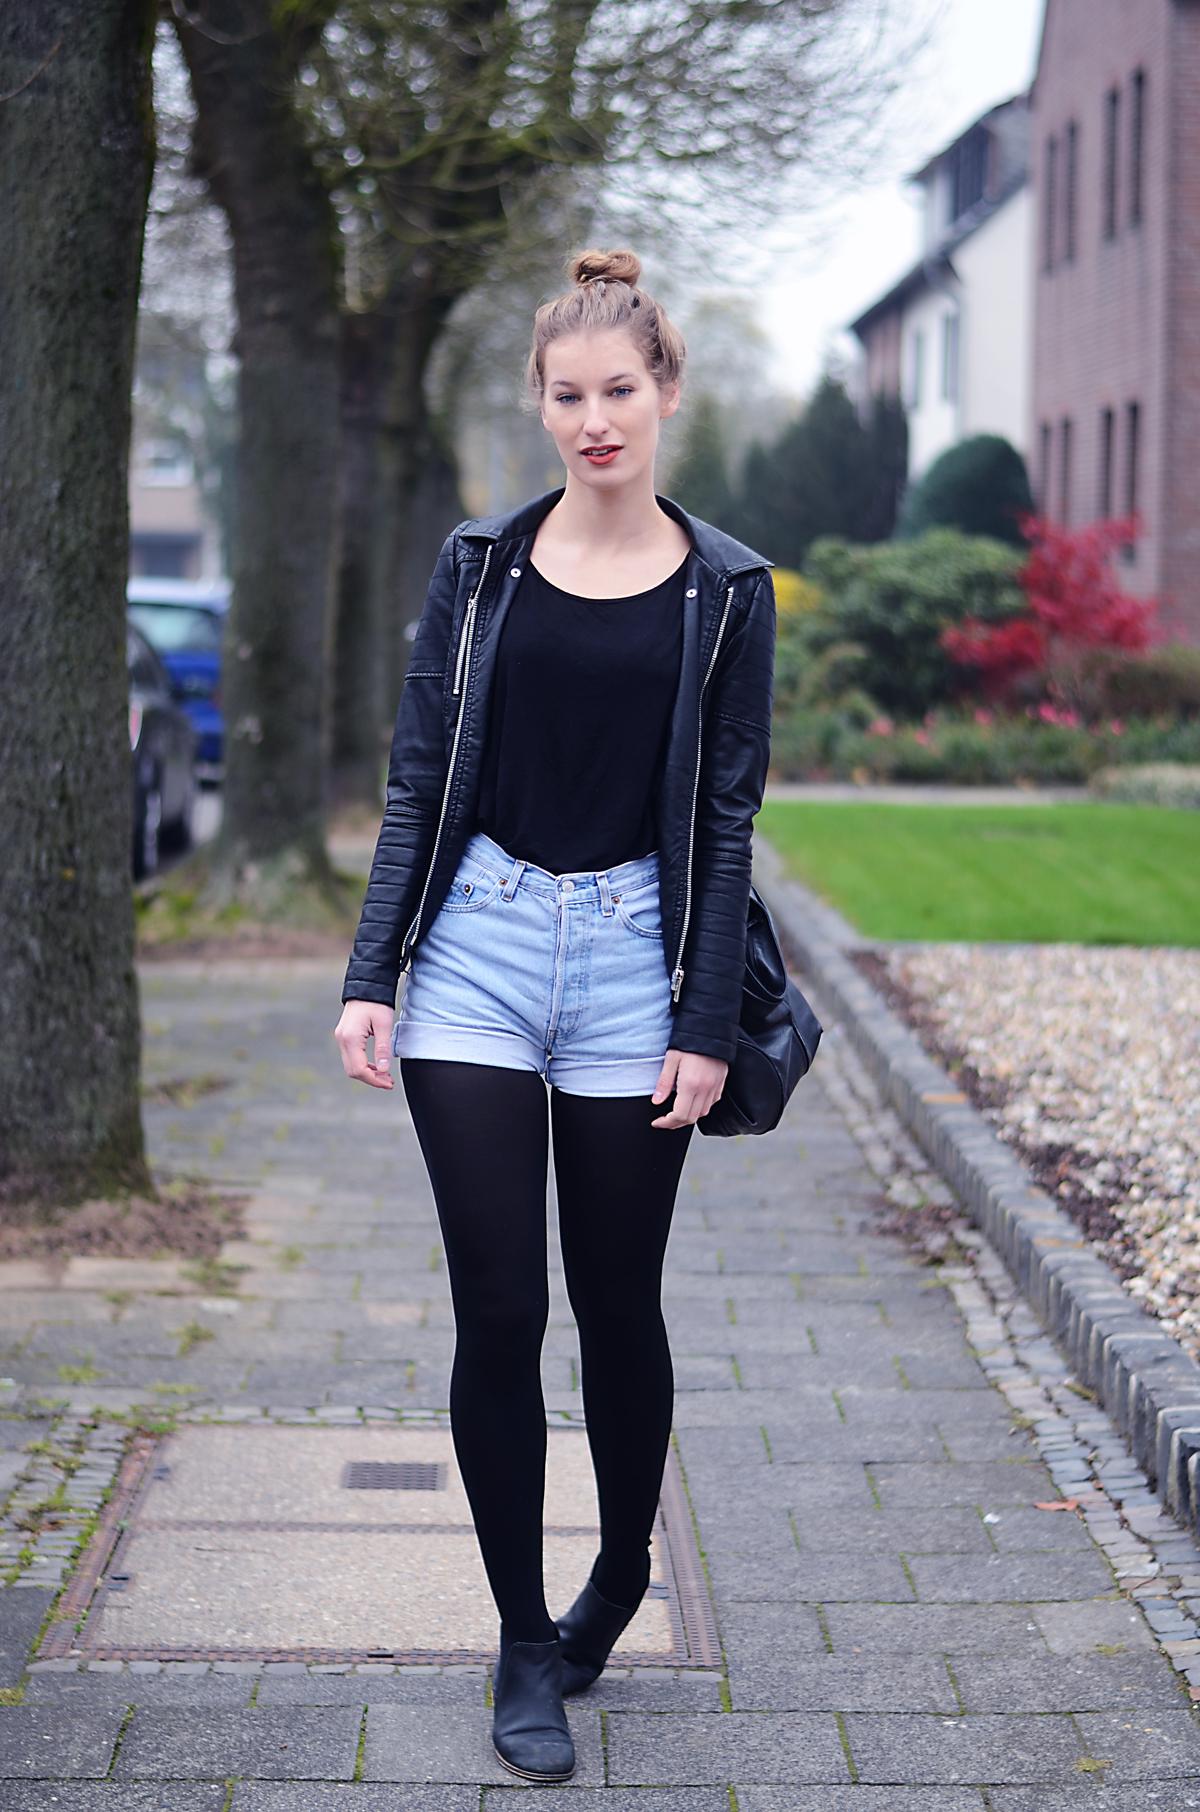 mais.oui - streetstyles.outfits.modeblog